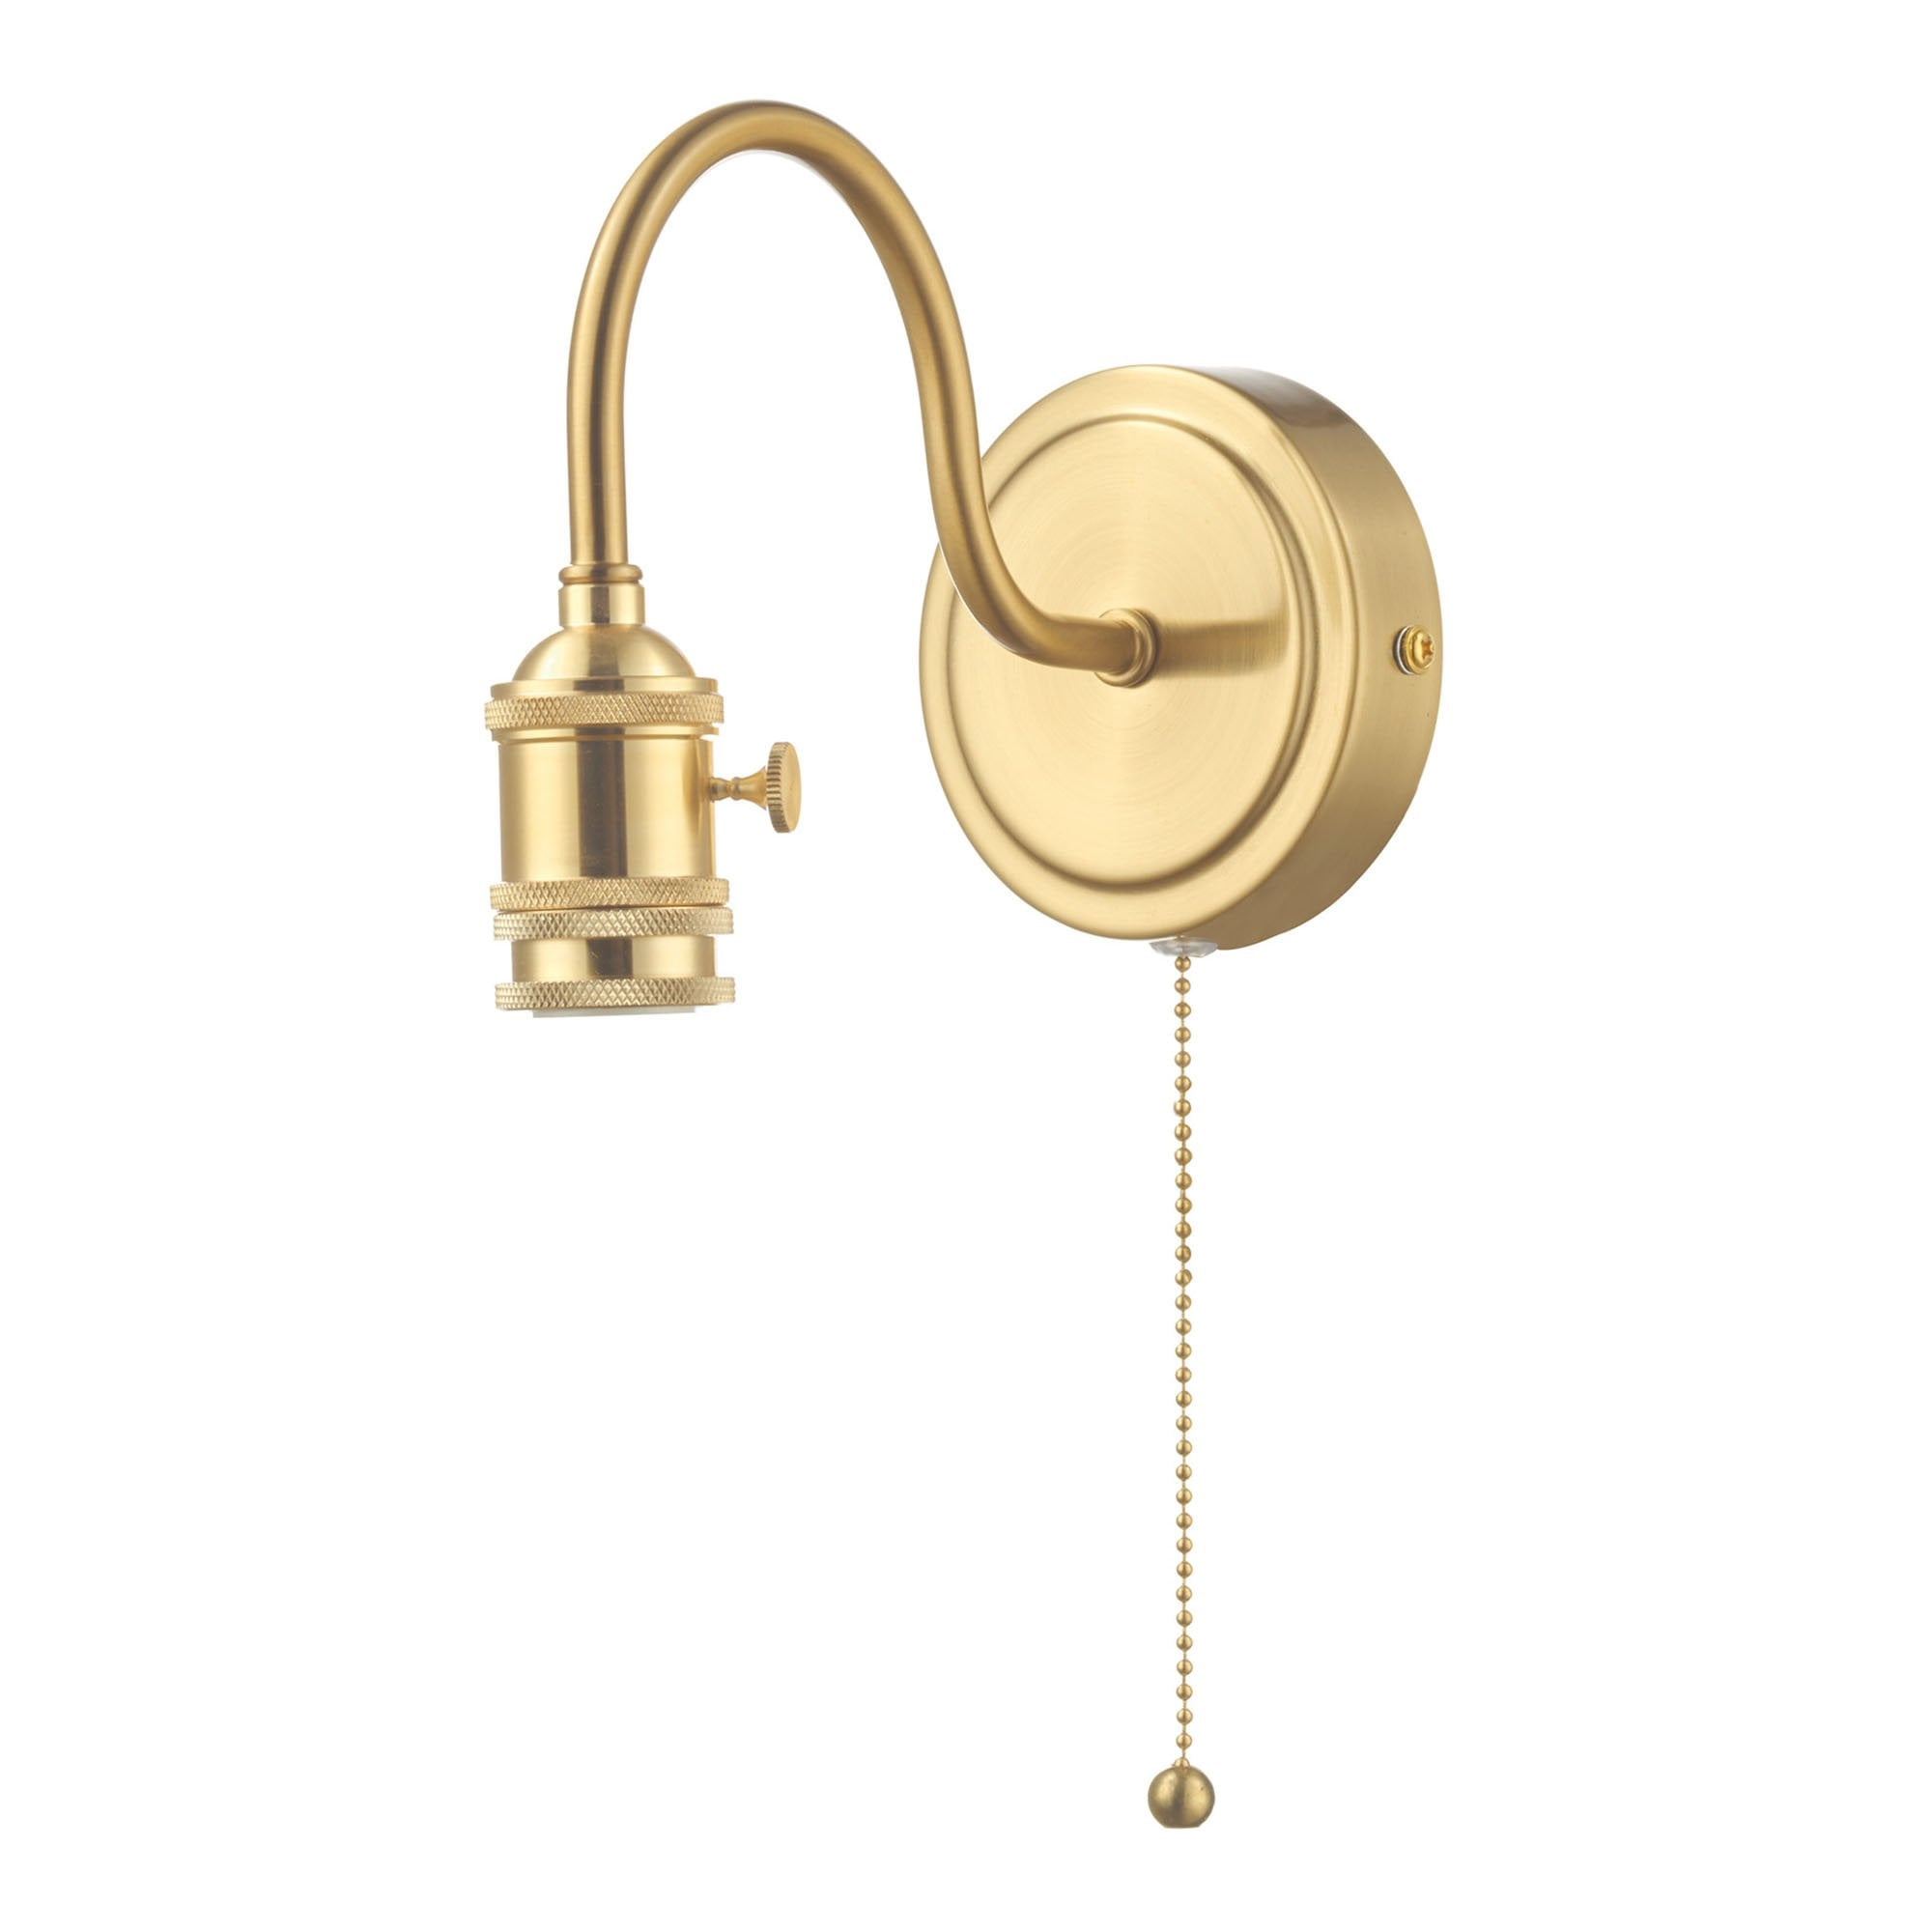 Single Wall Light Brass Bracket Pull Cord Switch Lighting Company Uk